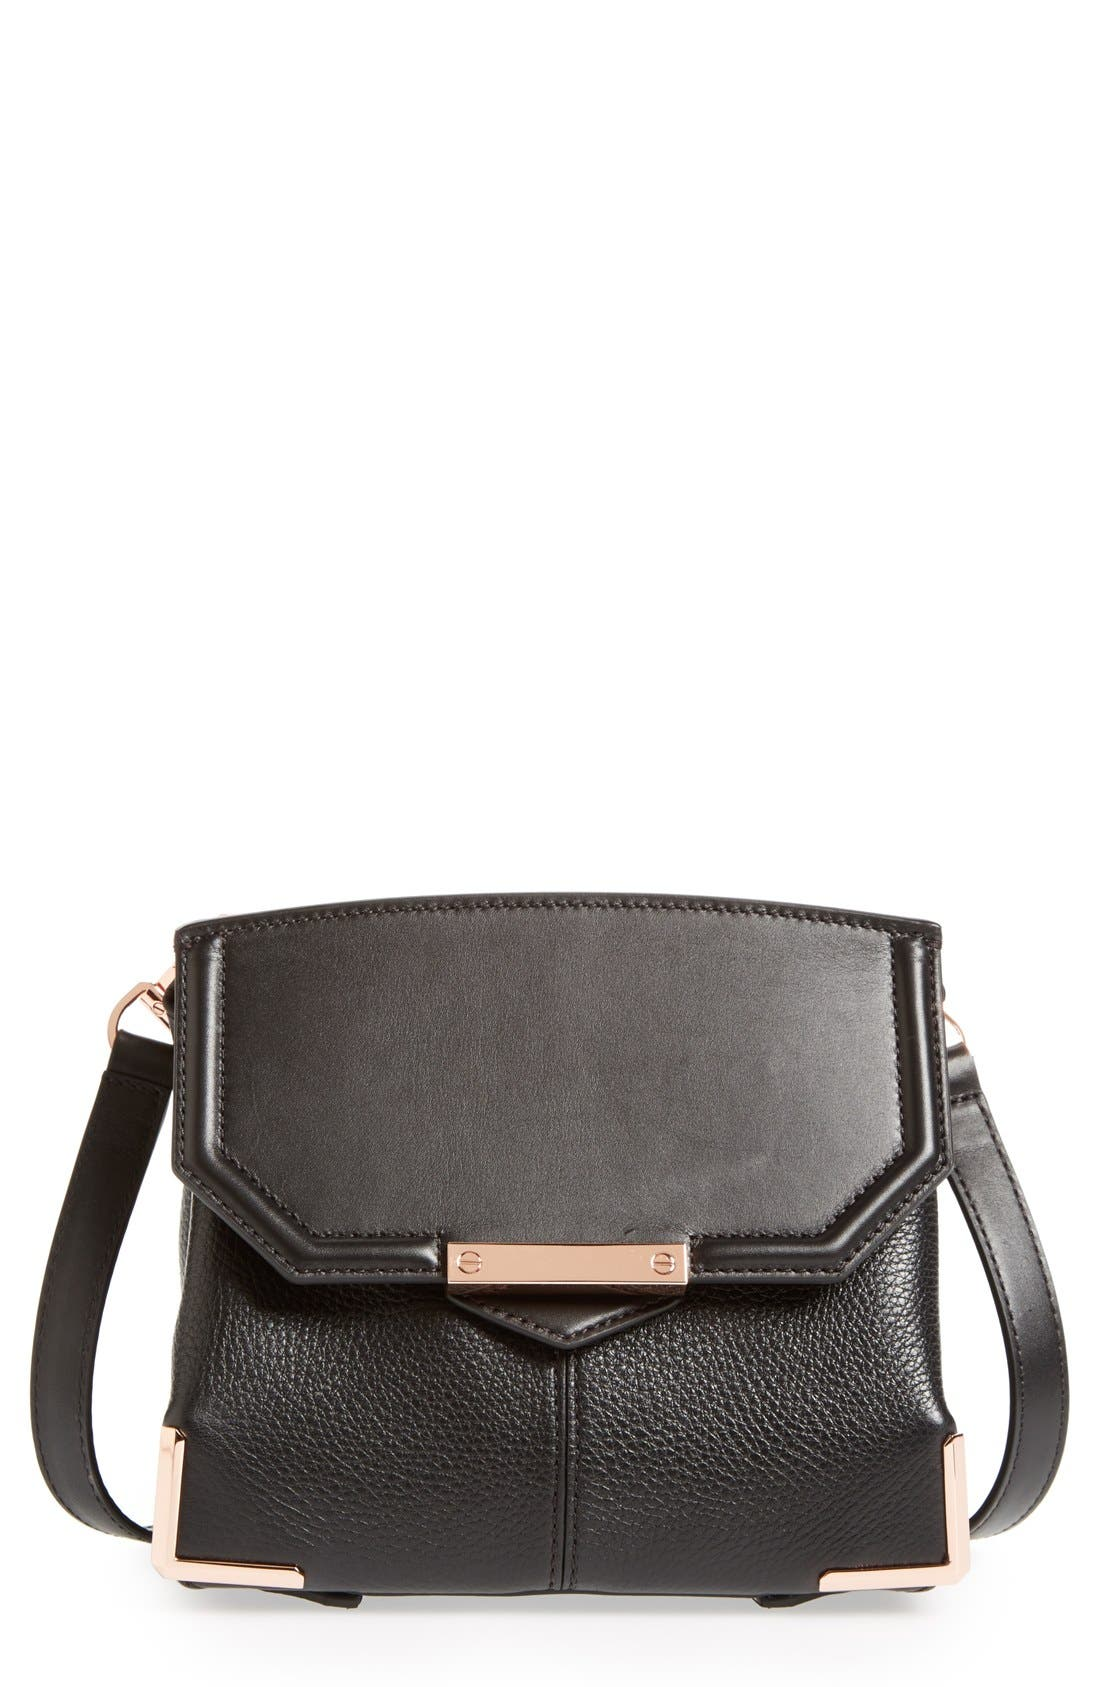 Main Image - Alexander Wang 'Marion Prisma' Leather Crossbody Bag